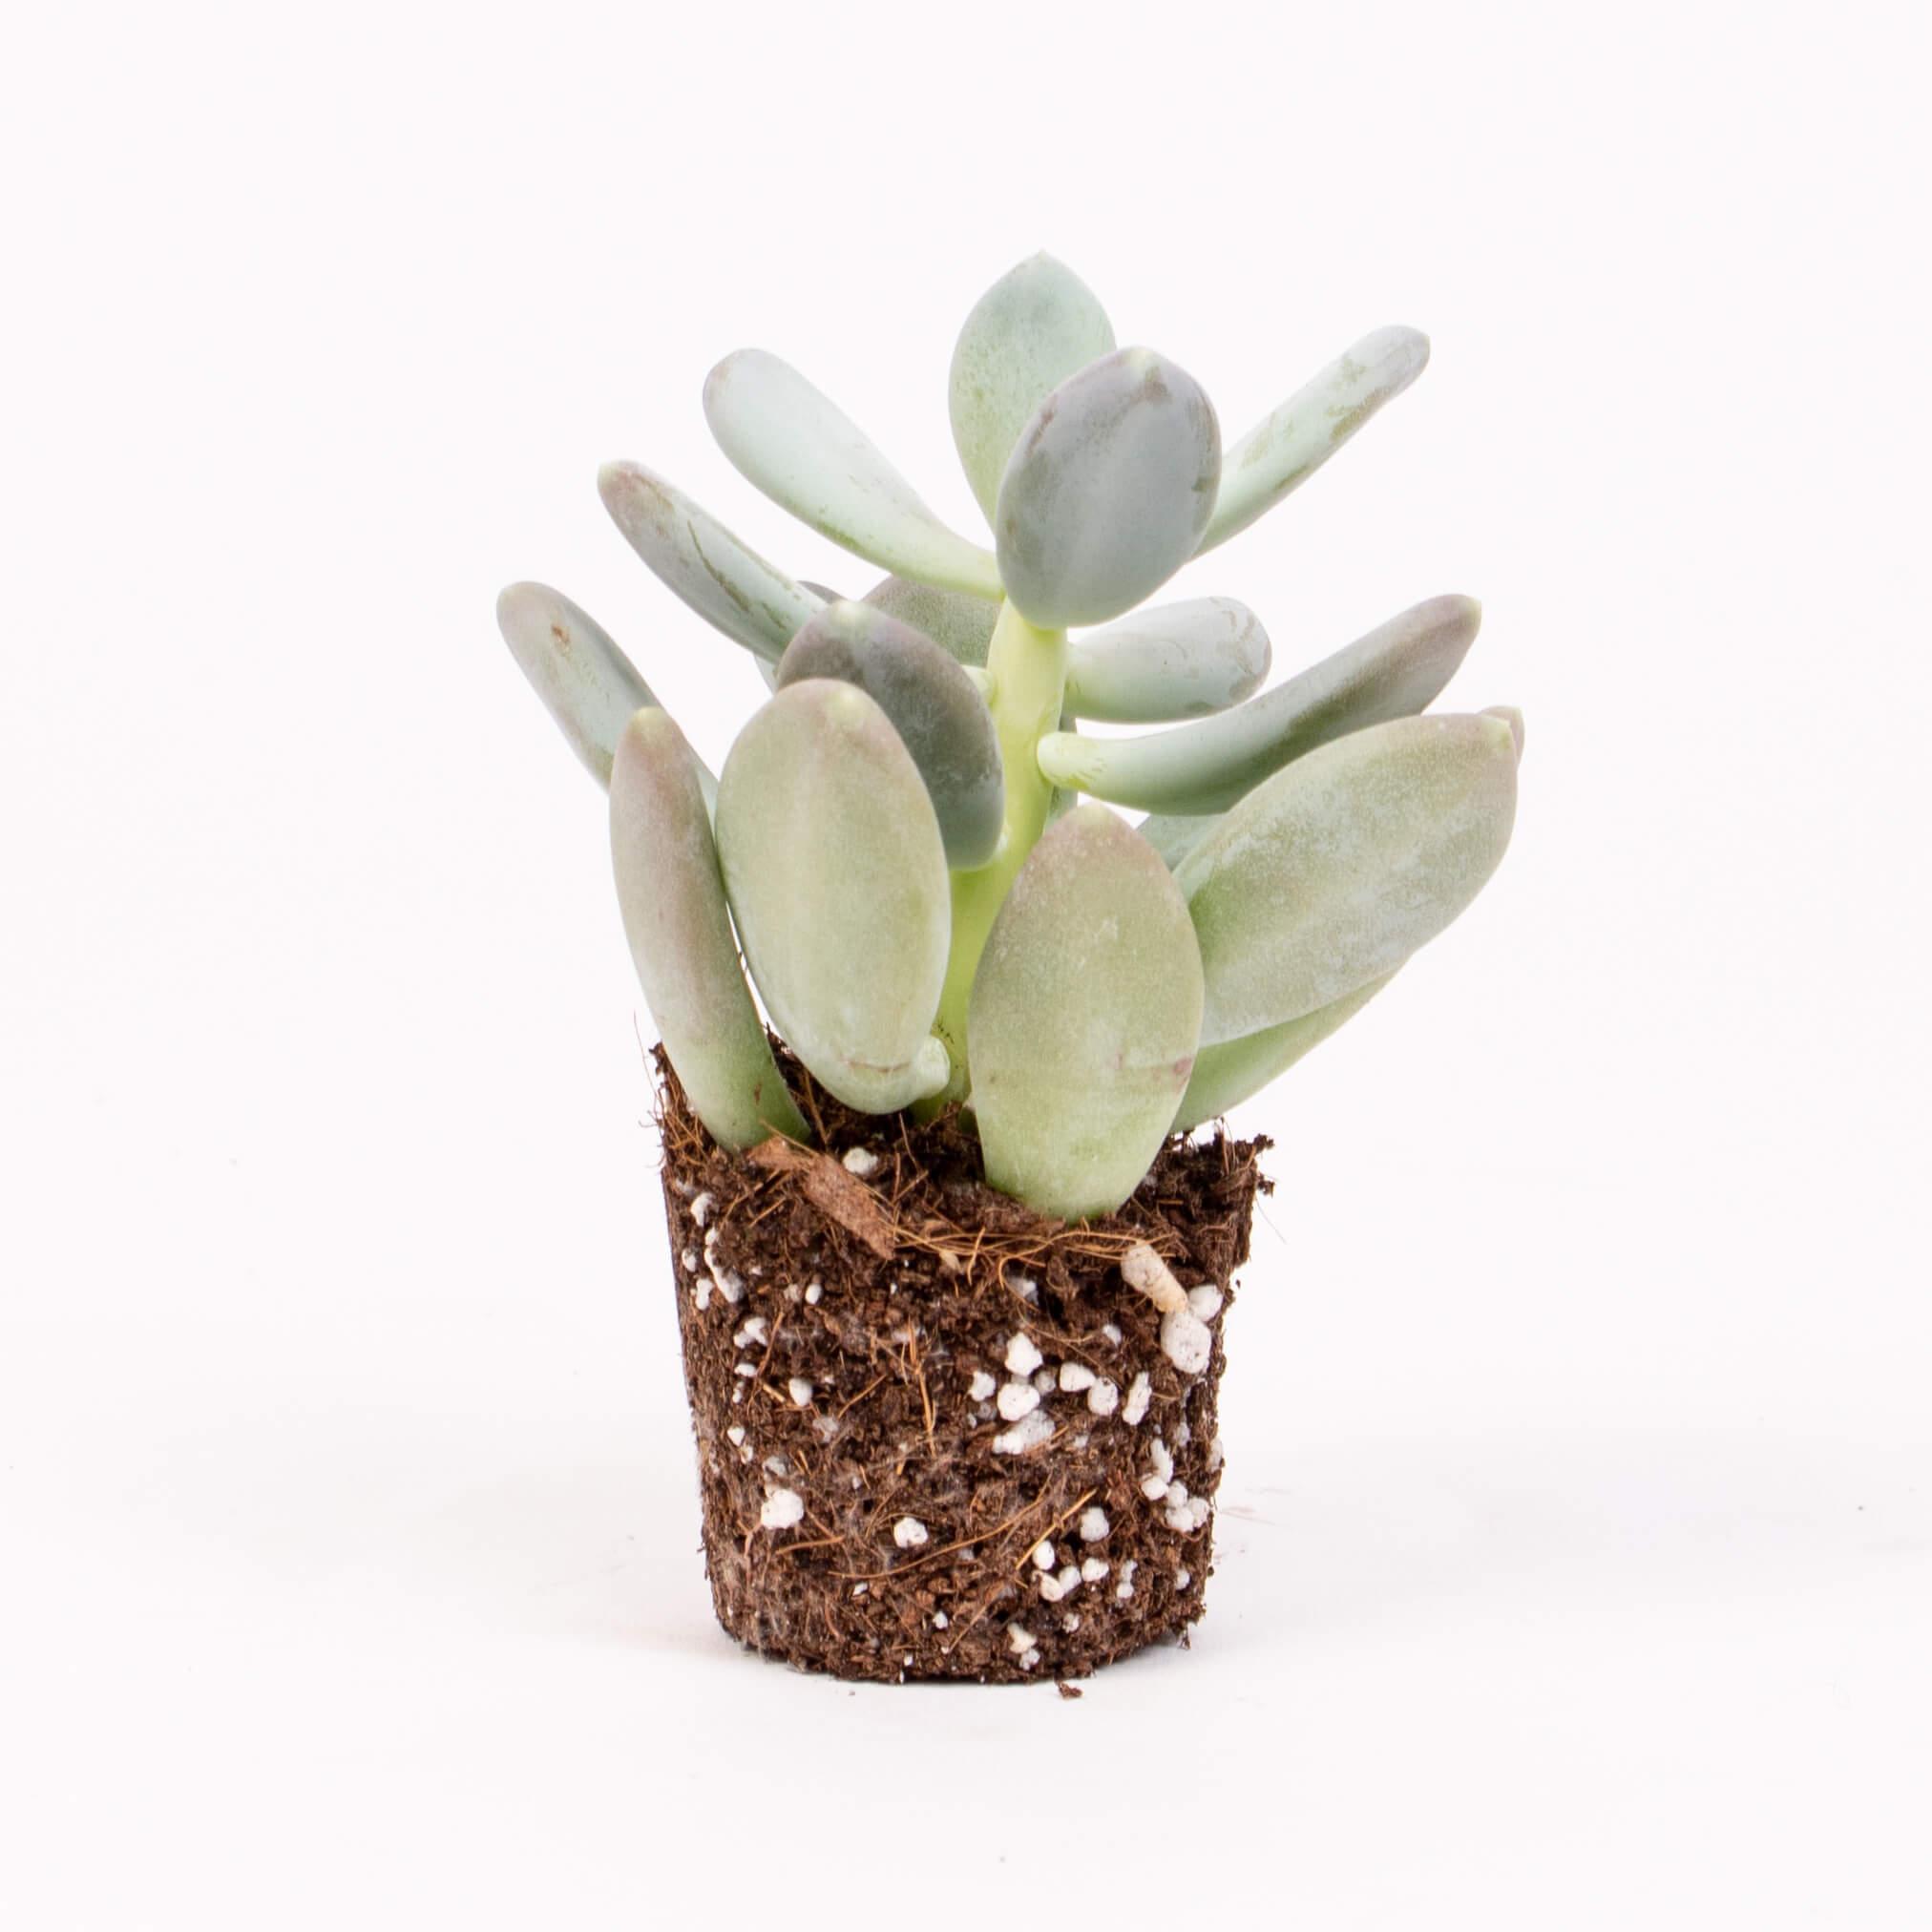 Planta phacitum oviferum